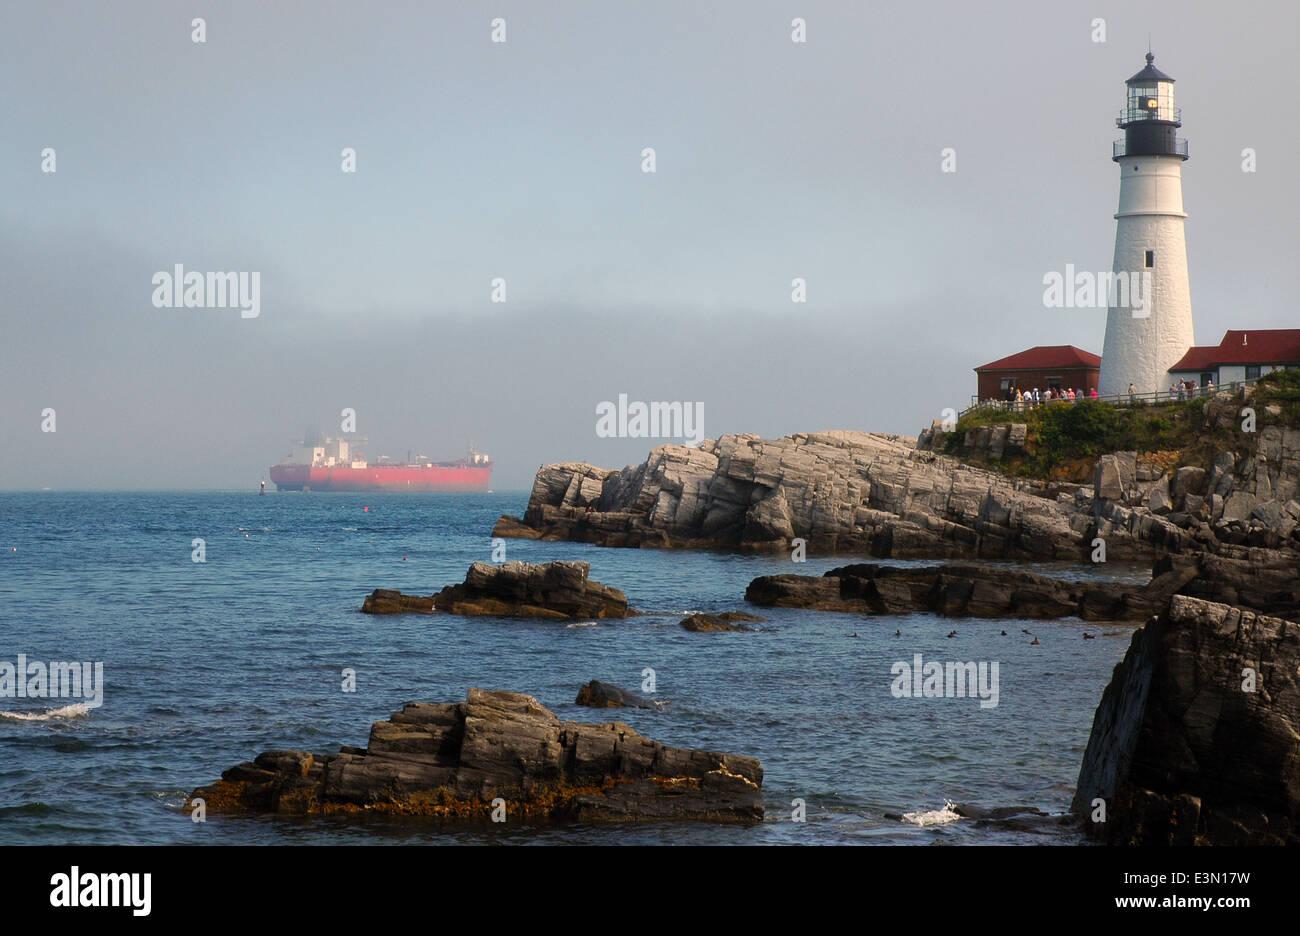 Lighthouses - guiding lights for ships